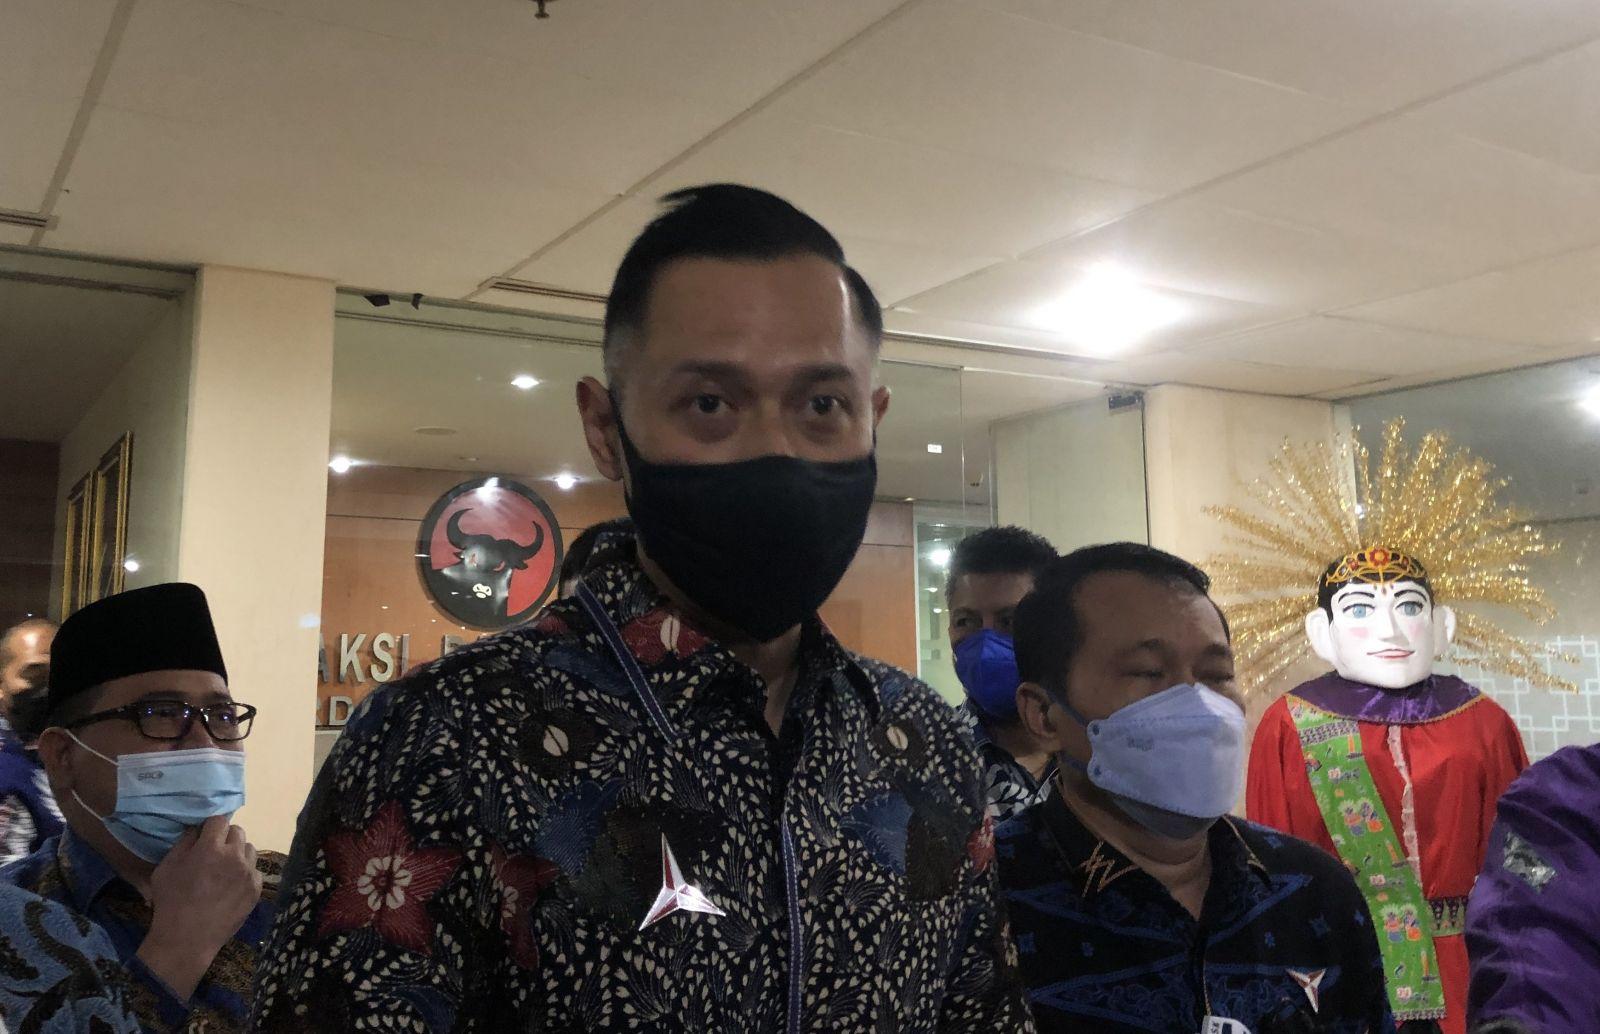 Ketua Umum Demokrat AHY Kunjungi DPRD Jakarta. Foto : Mia Kamila/GenPI.co